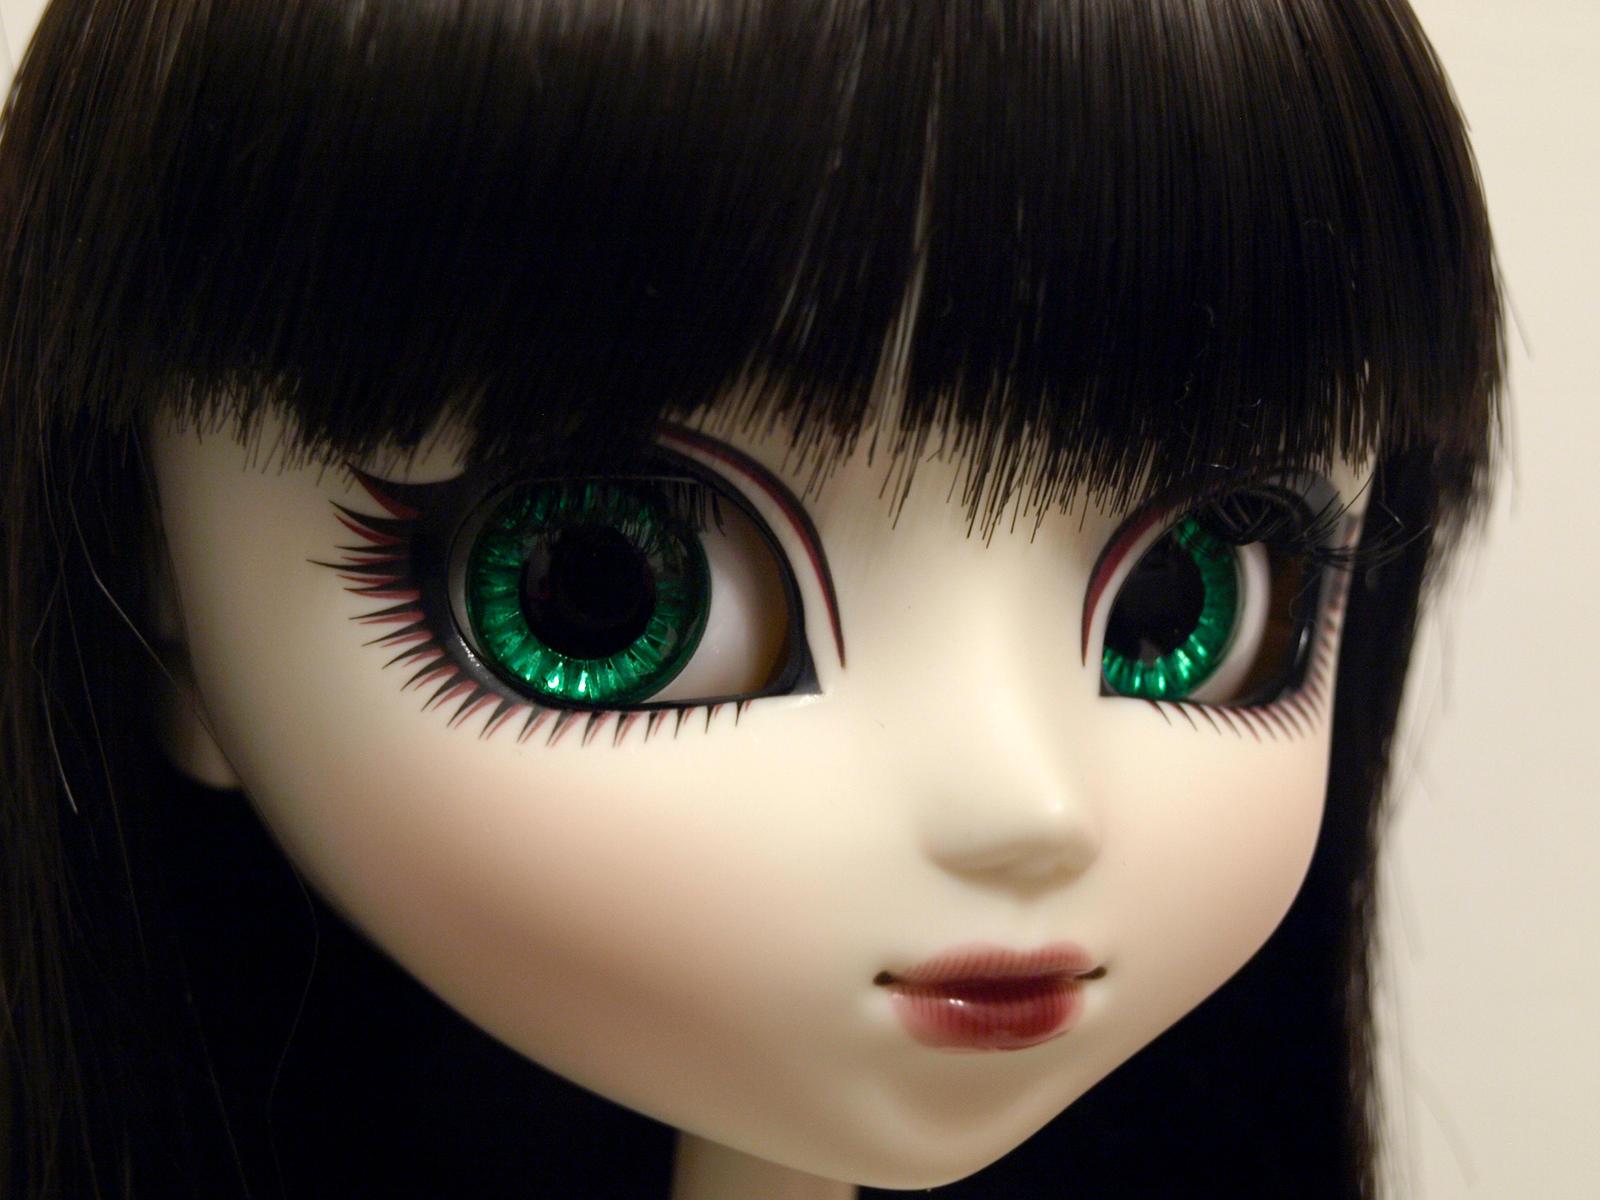 Mir's new eyechips by serenainwonderland